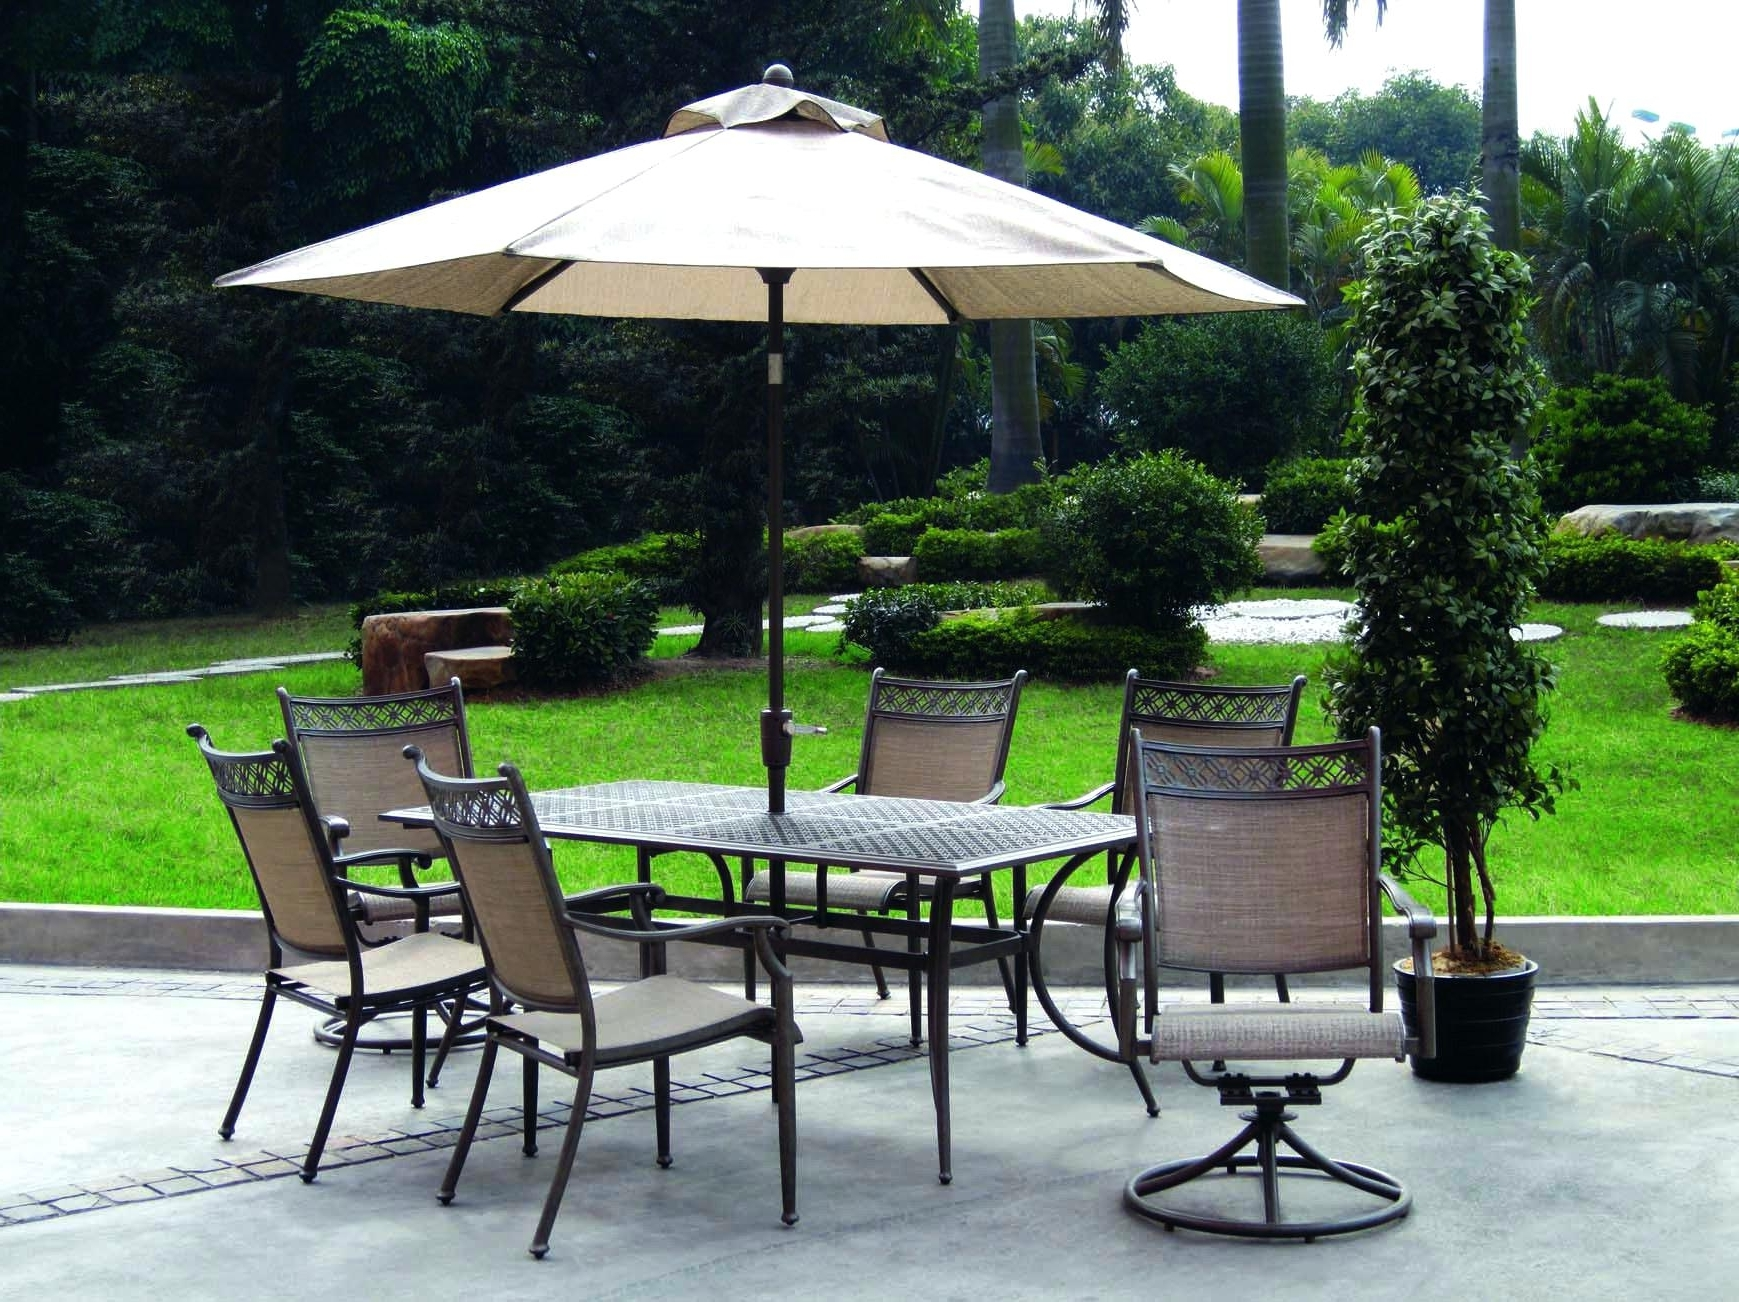 Widely Used Hampton Bay Outdoor Furniture Sets Patio Umbrella Replacement Parts With Hampton Bay Patio Umbrellas (View 10 of 20)